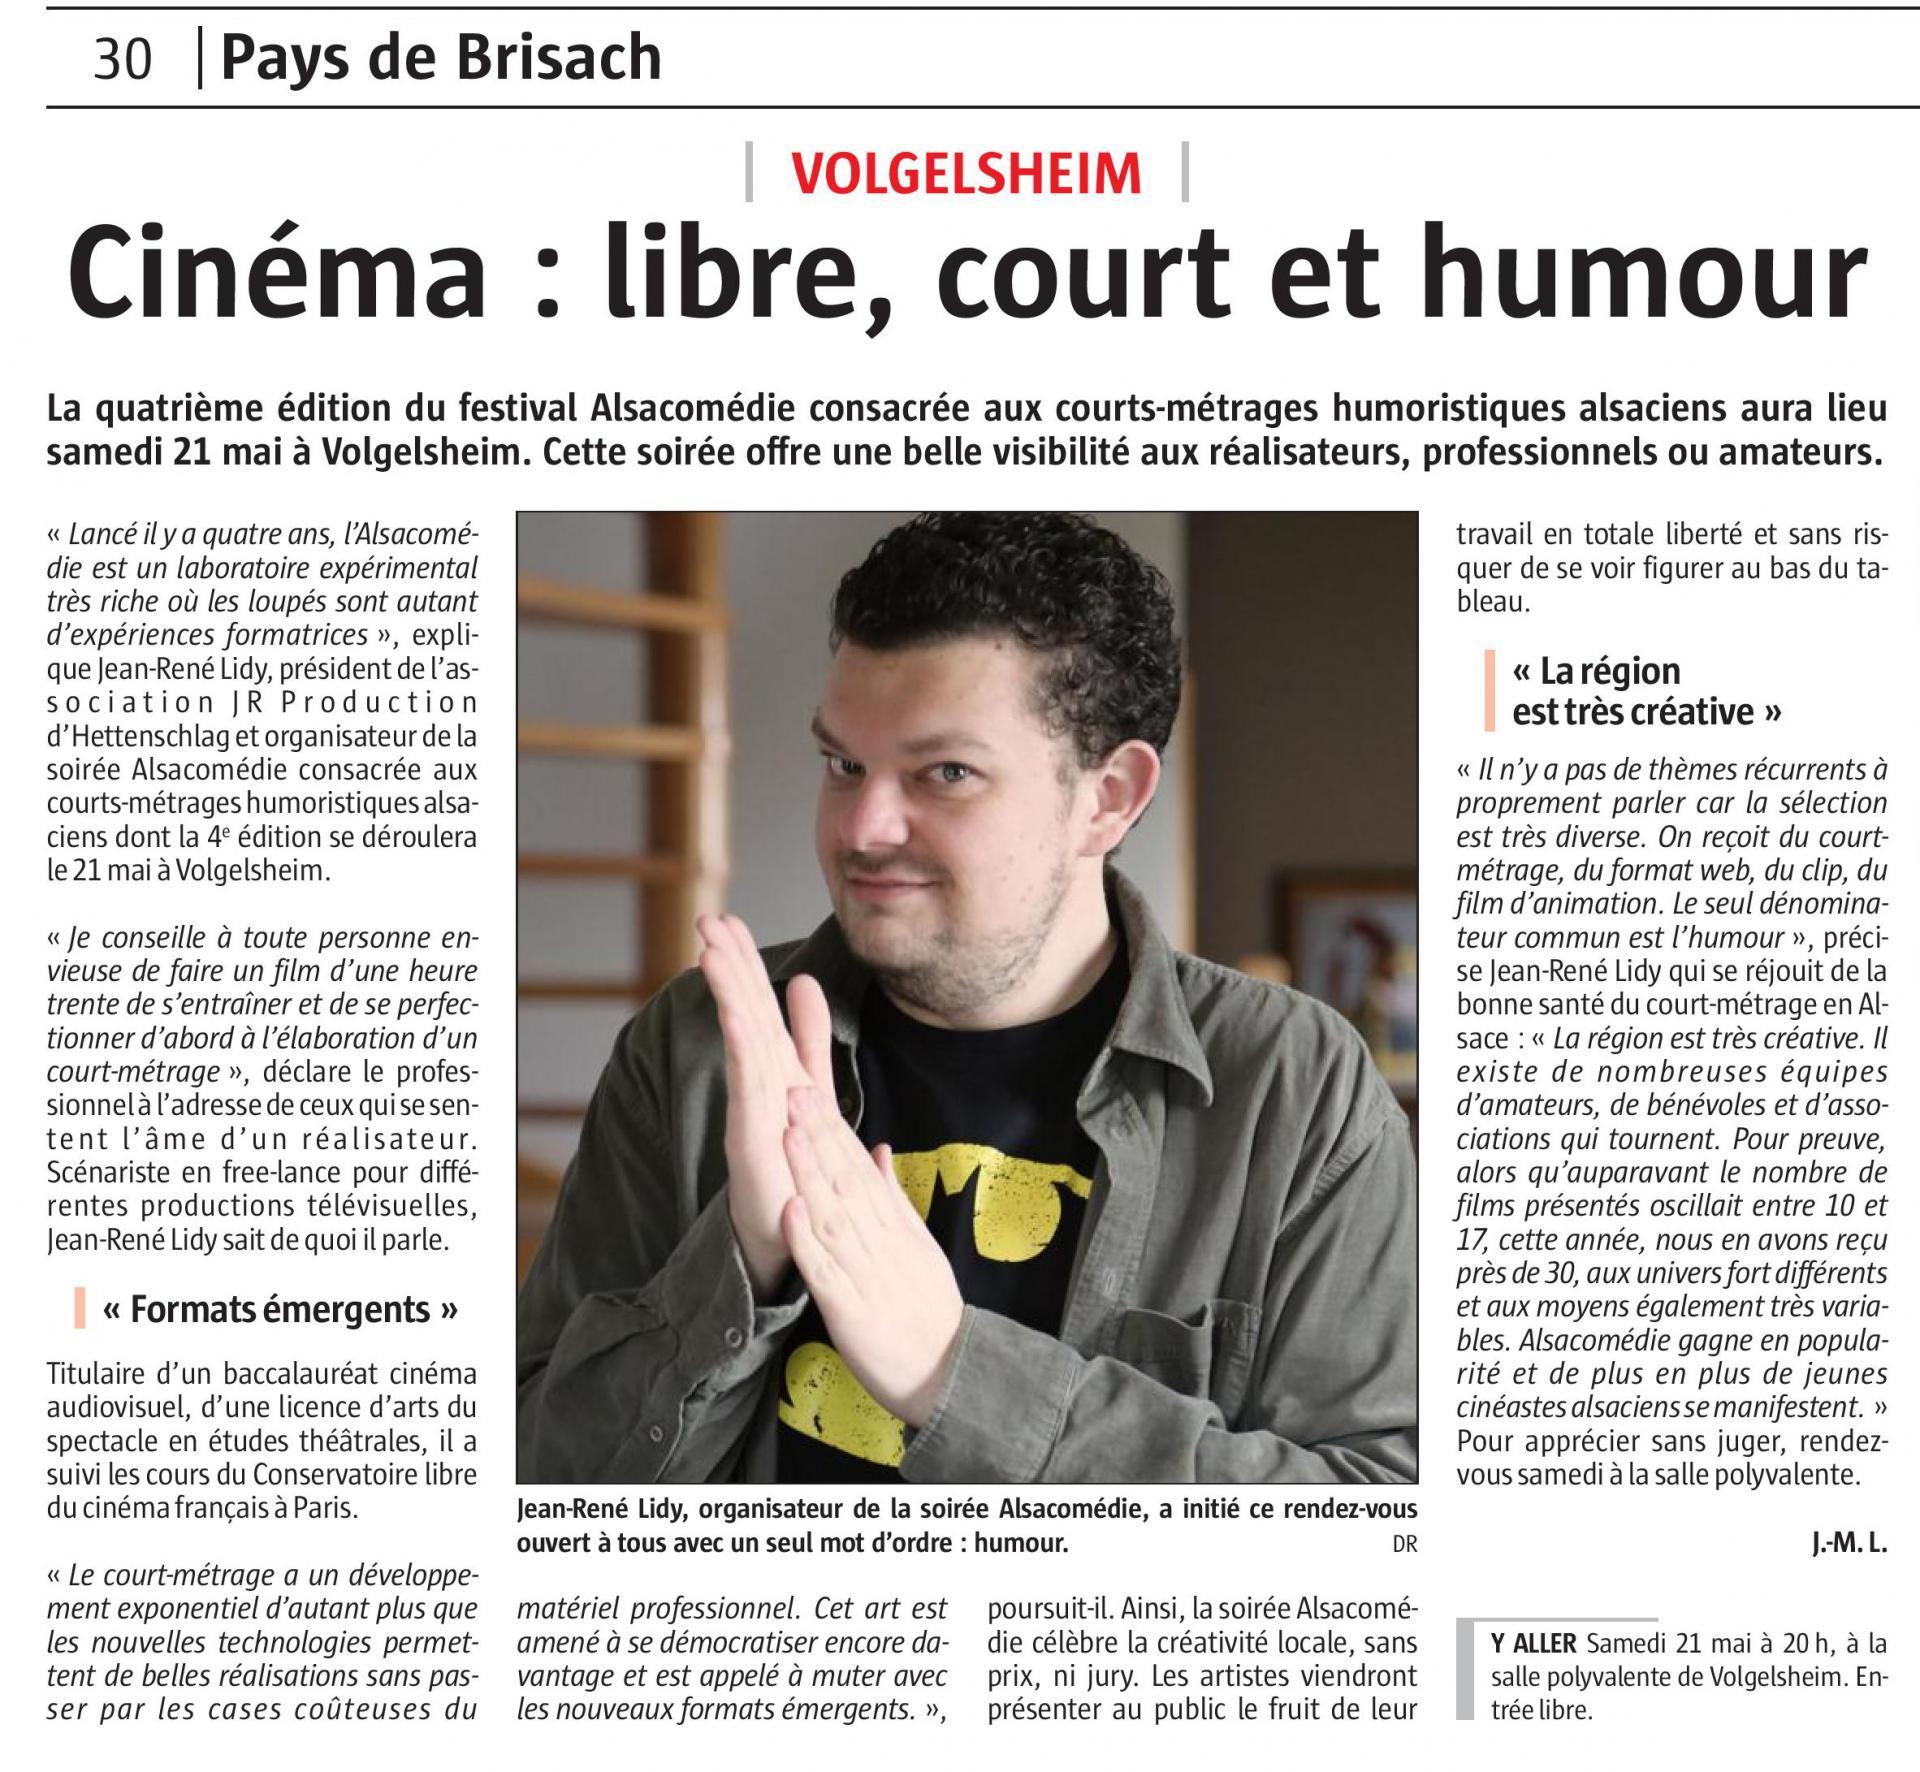 Journal L'ALSACE - 20 mai 2016